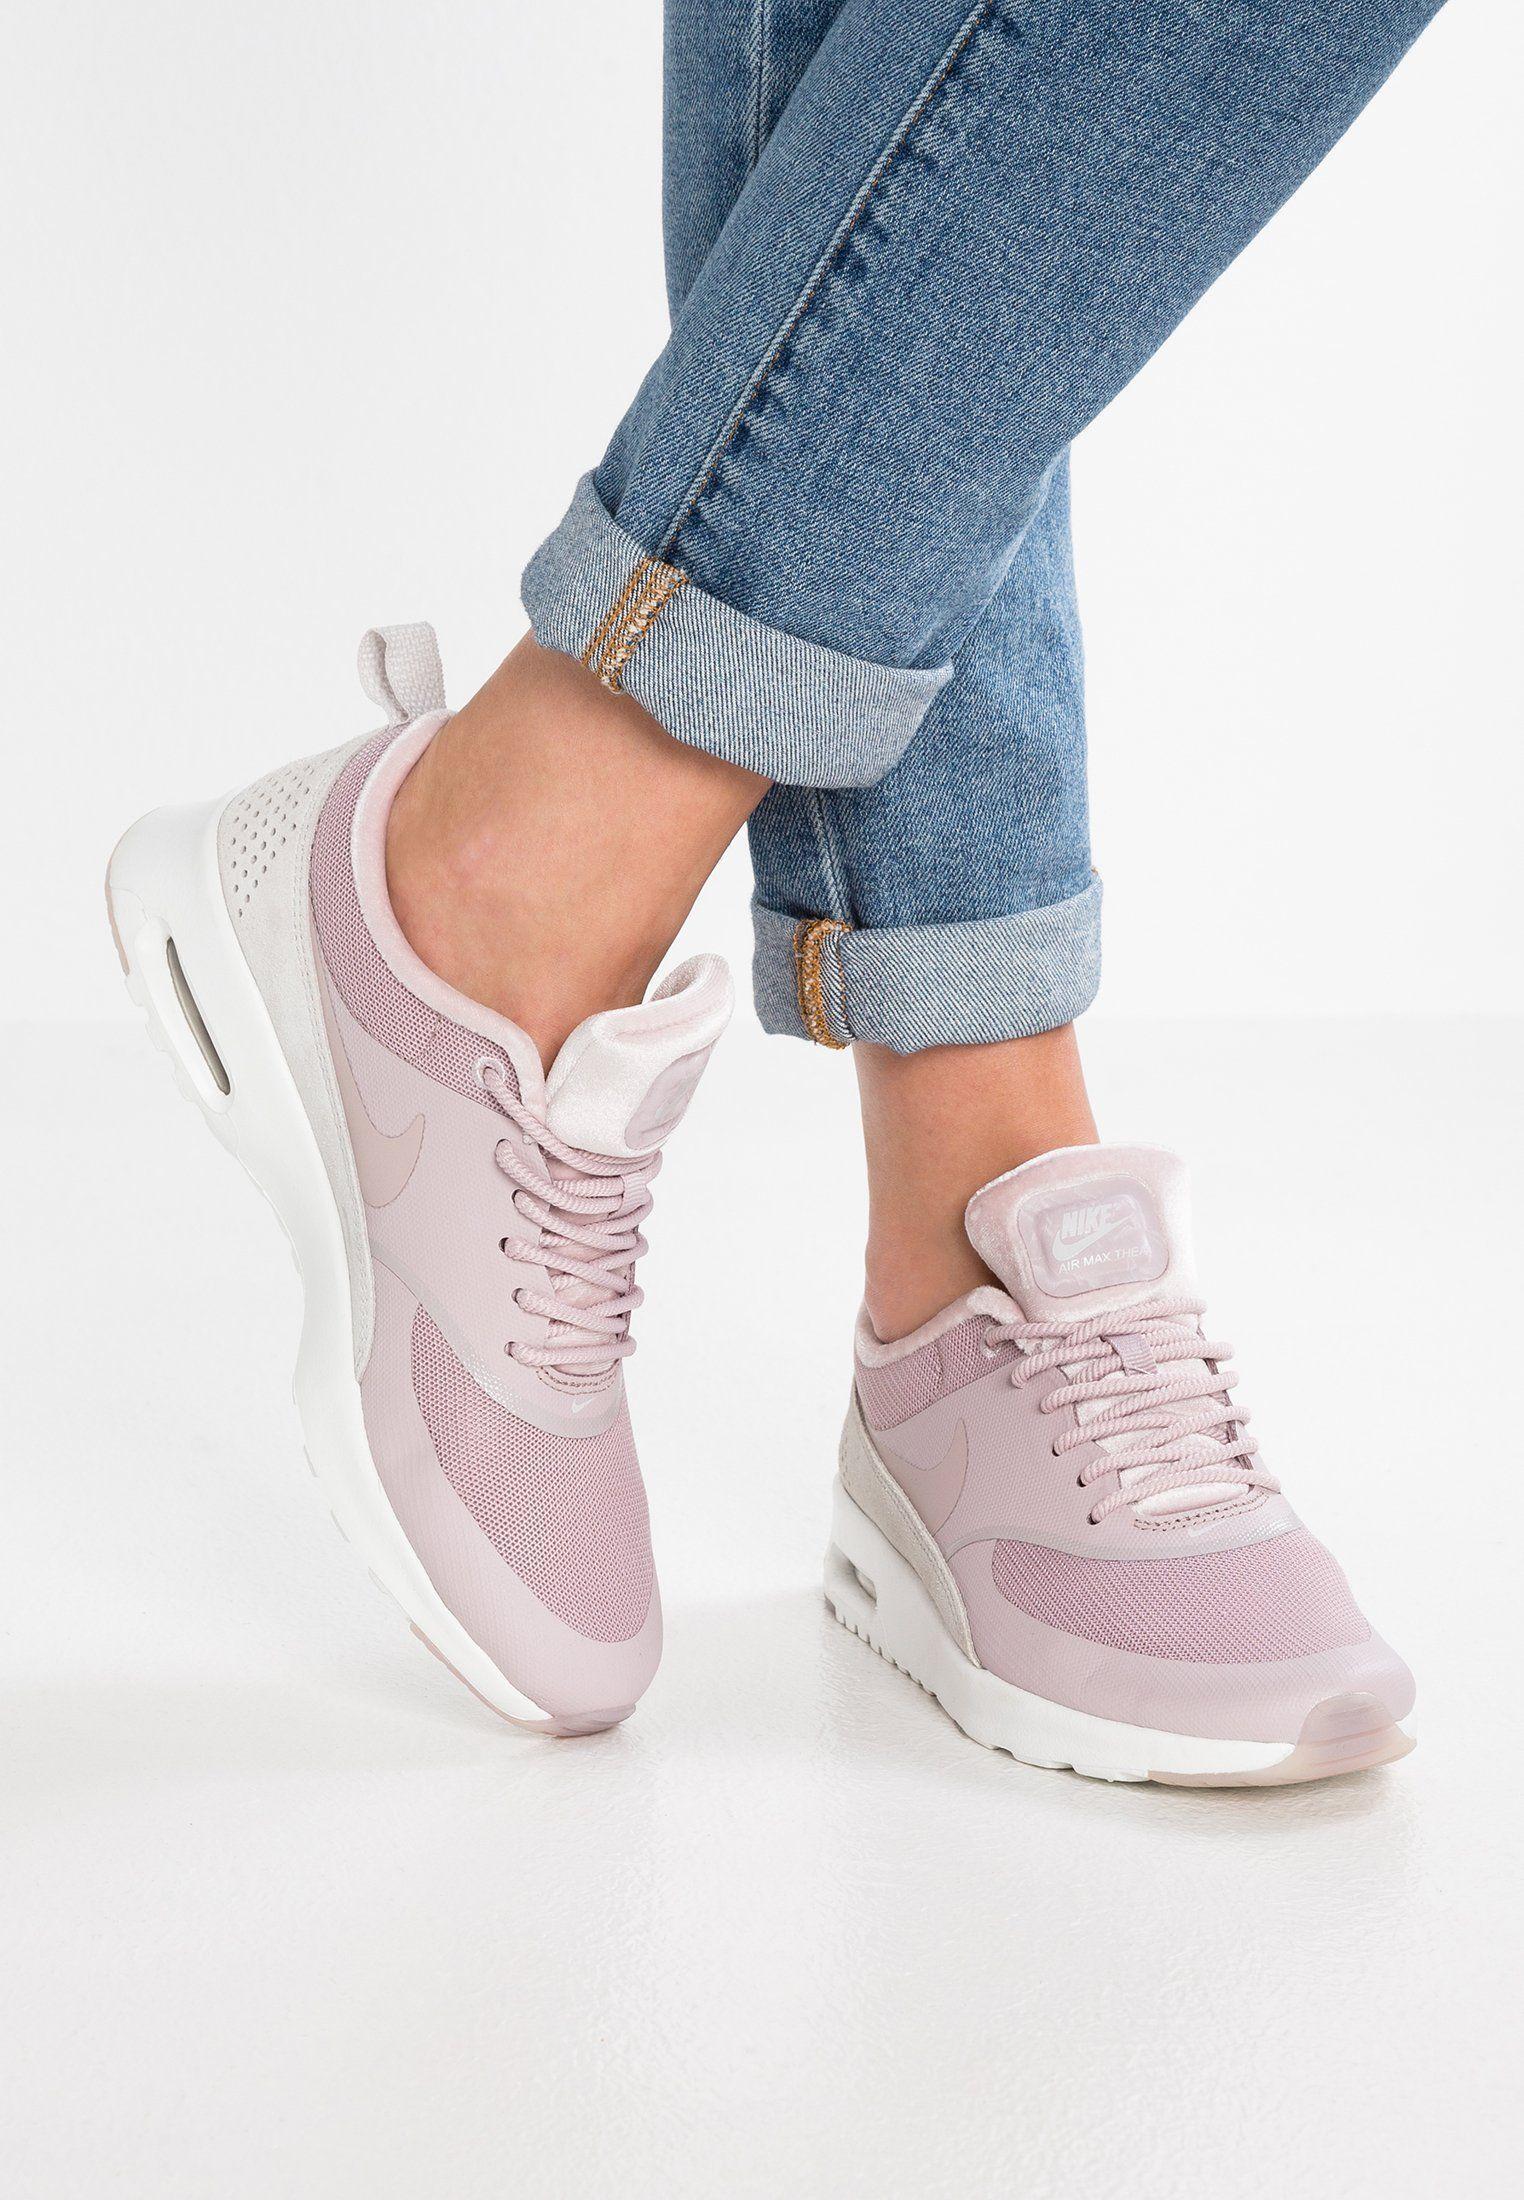 Nike Air Max Thea in grauhellrosa Foto: sneakerparadies